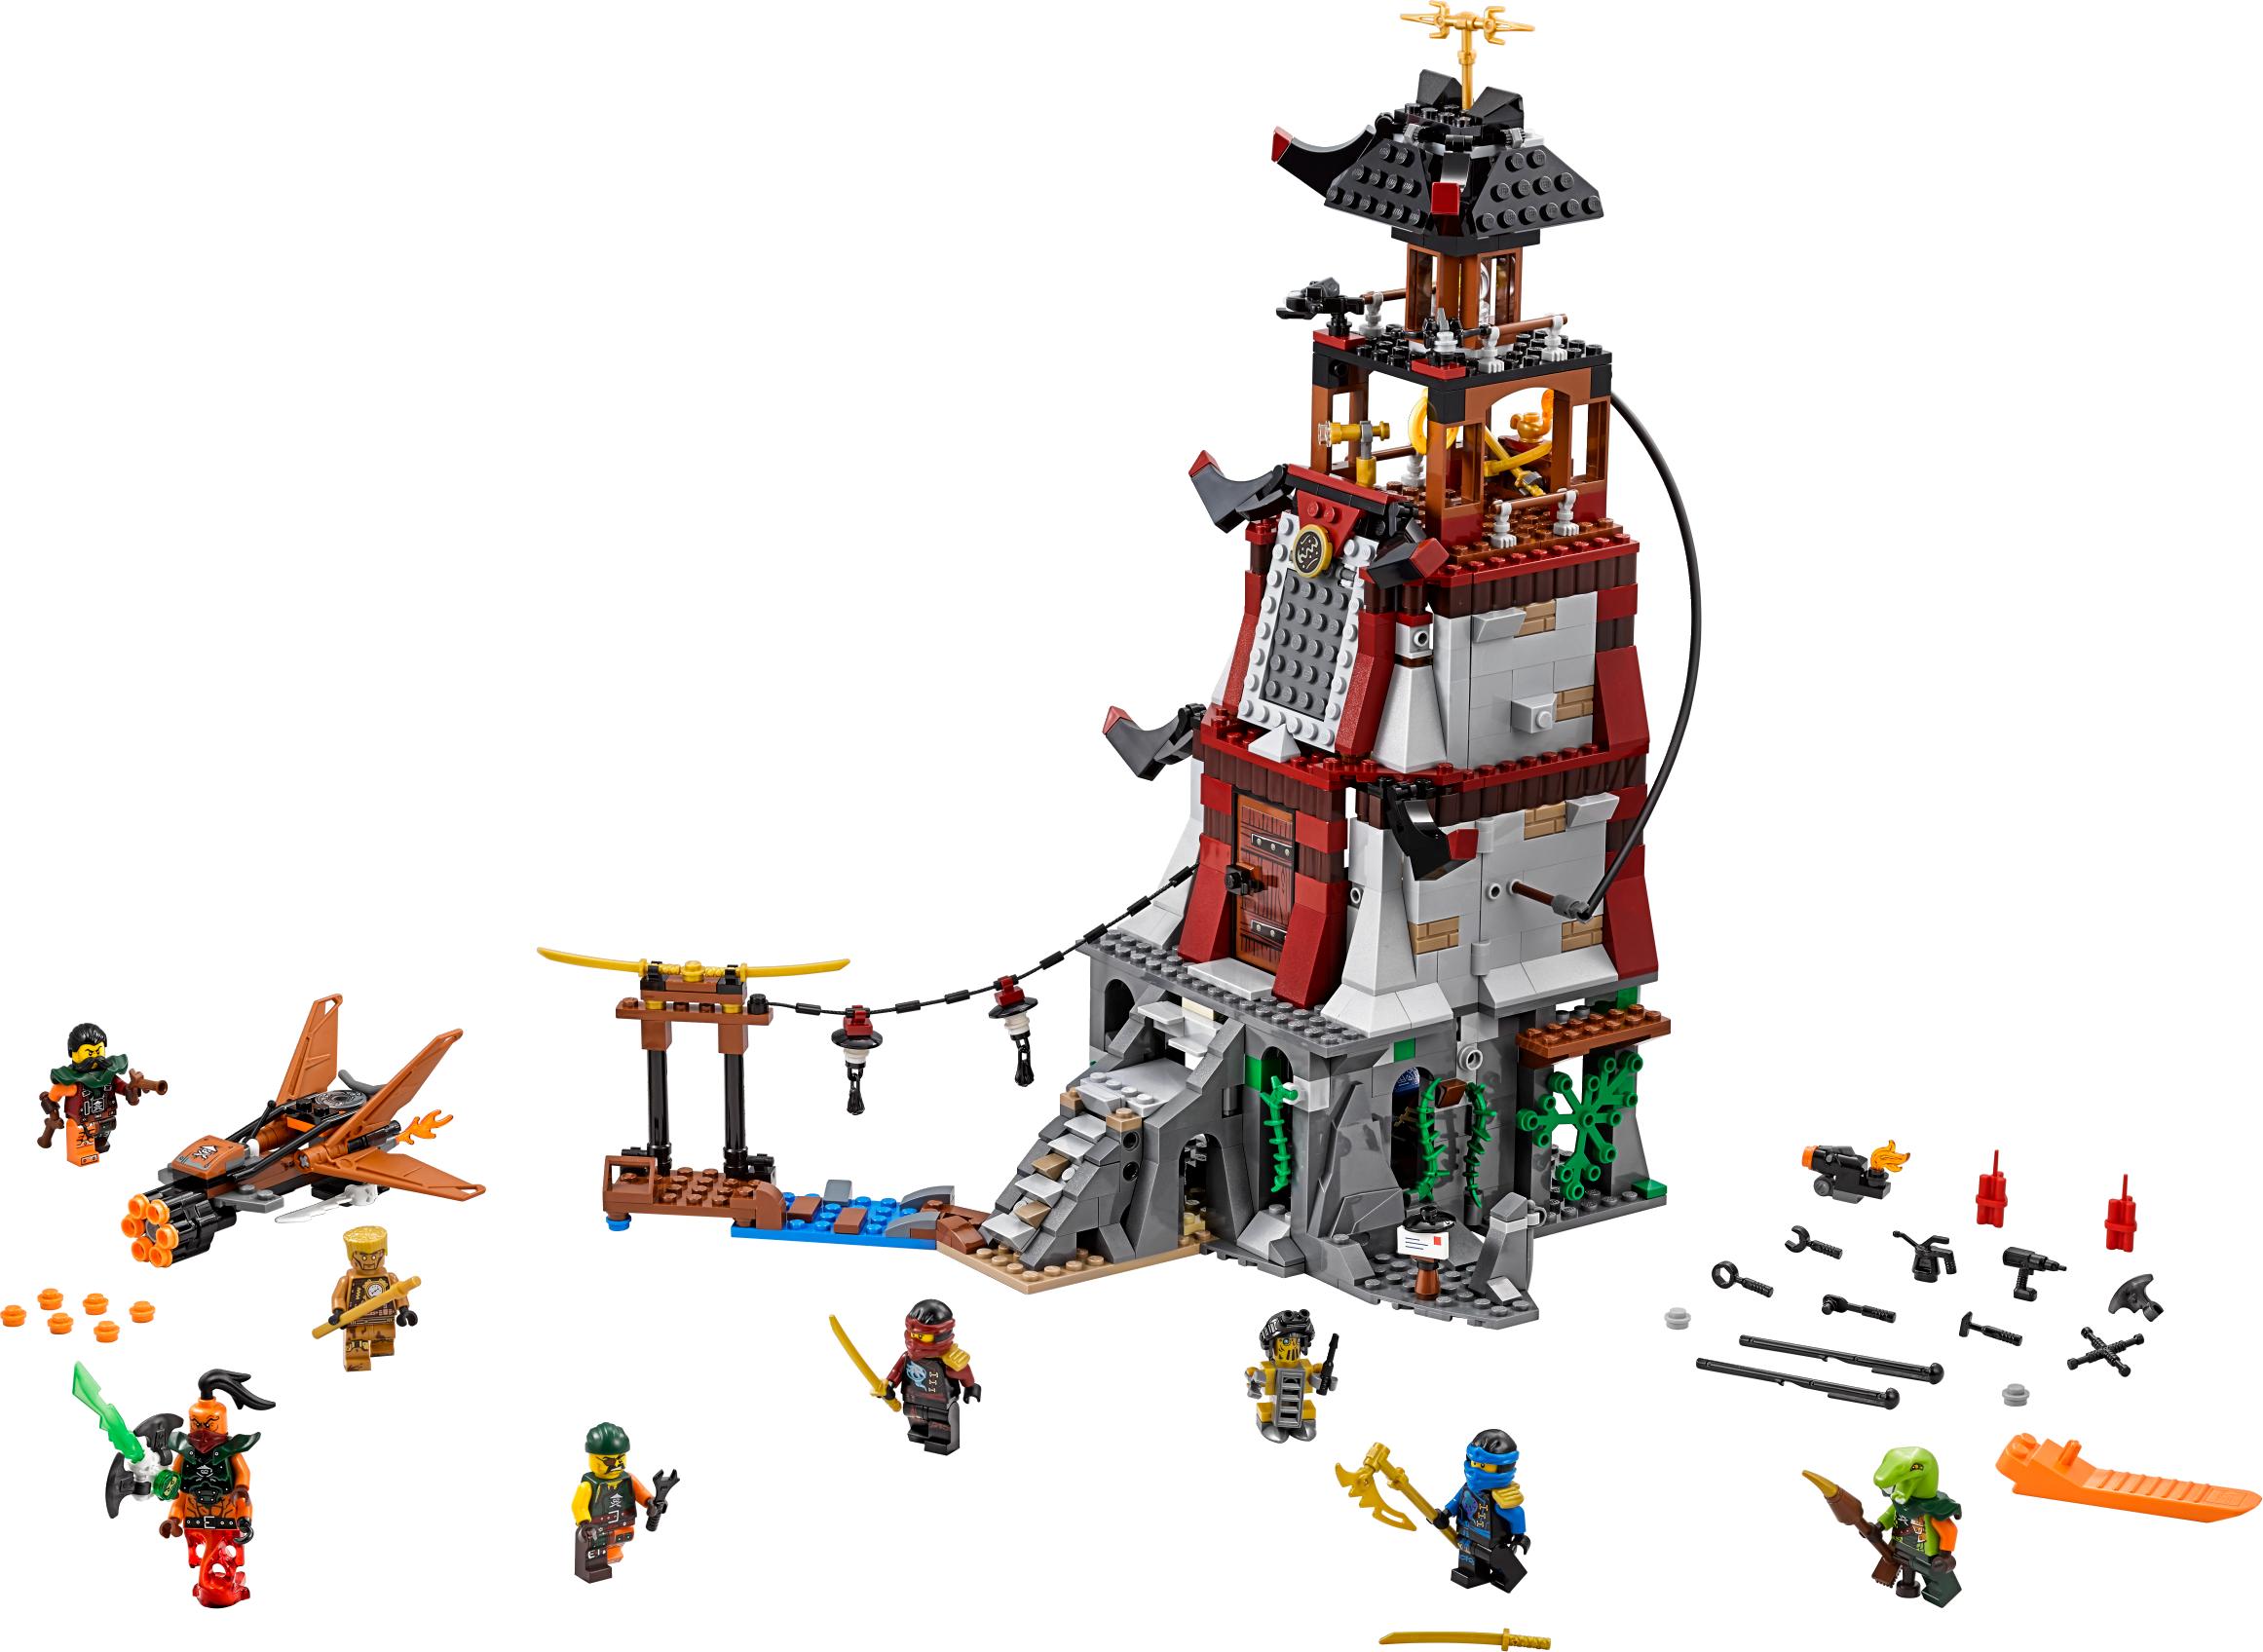 The Lighthouse Siege